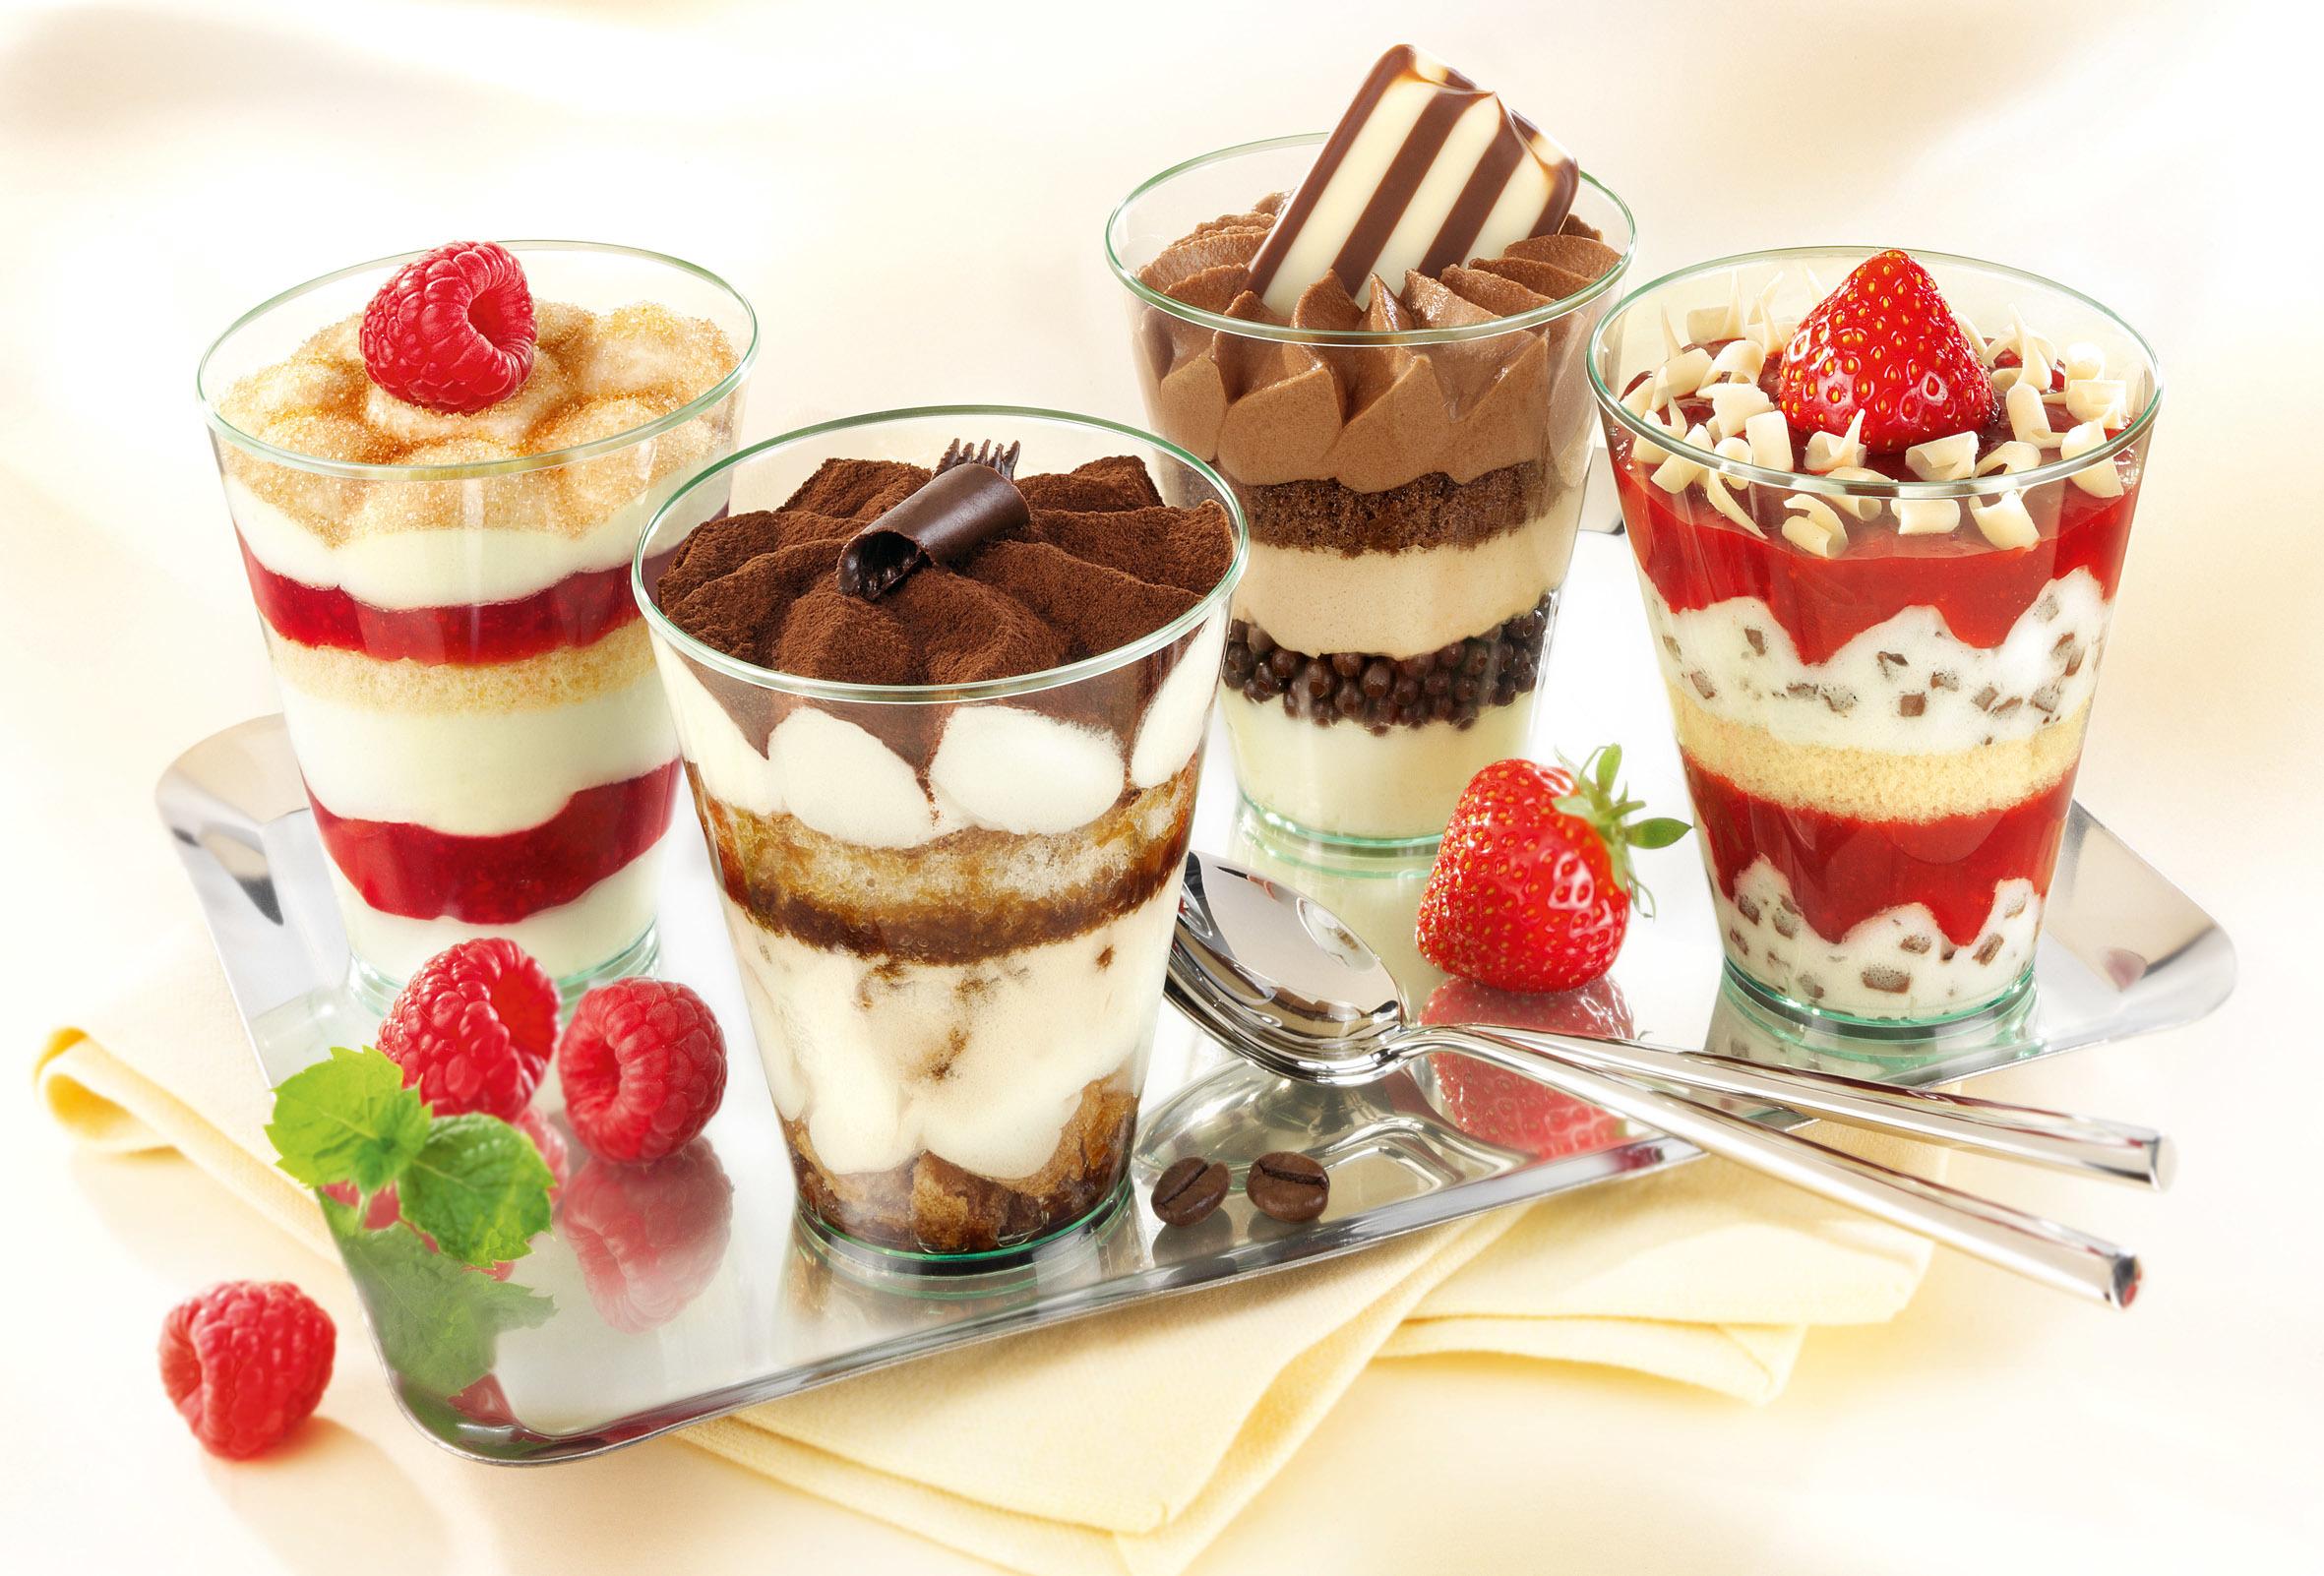 Images of Dessert   2362x1602